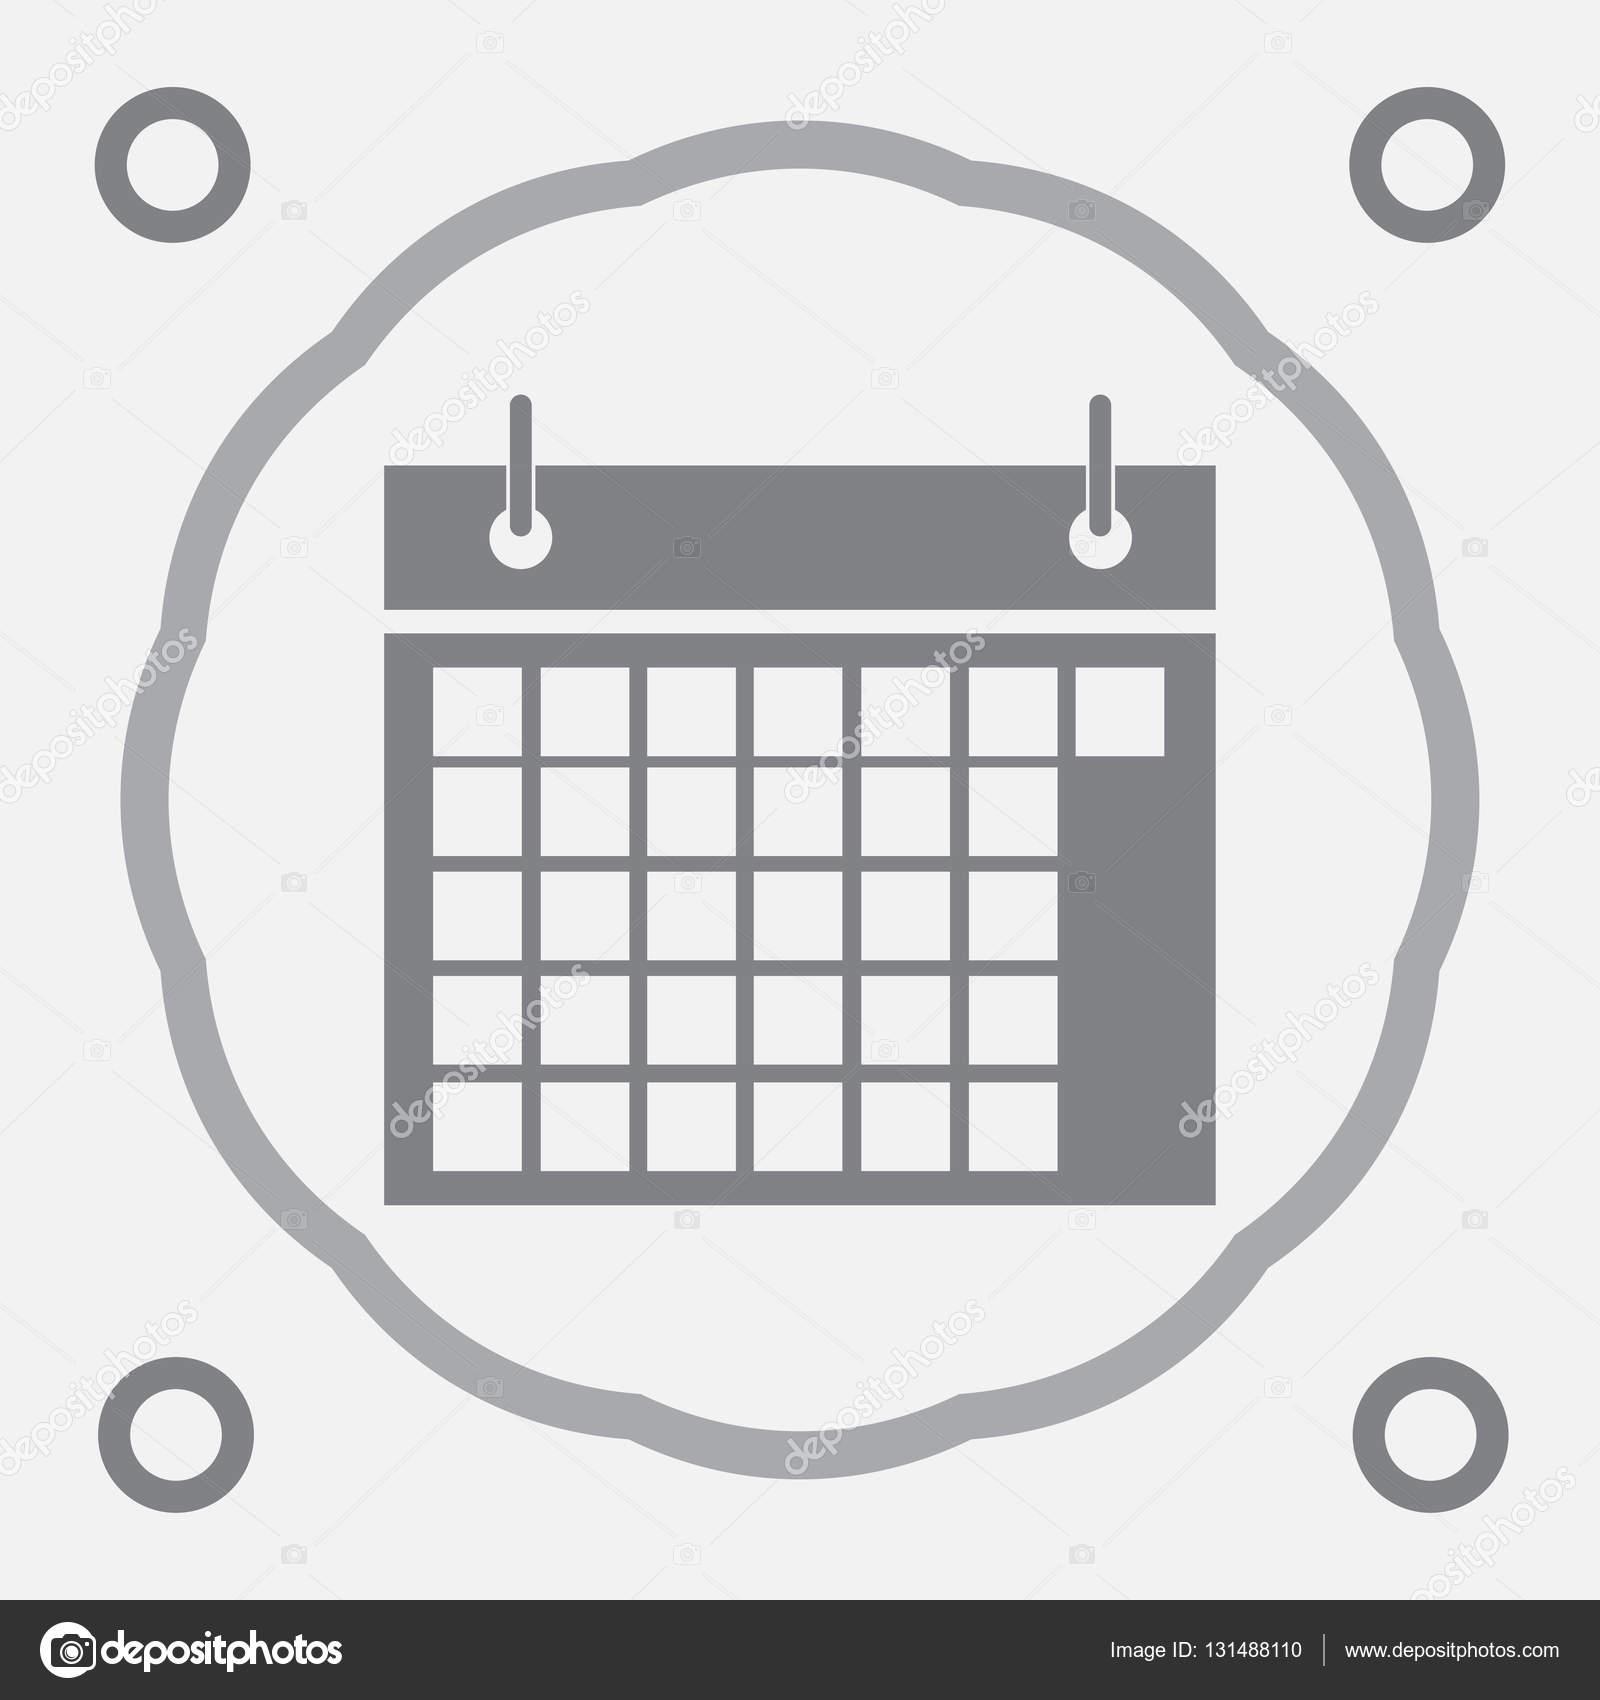 Calendar Icon In Trendy Flat Style Isolated On Grey regarding Calendar Icon Grey